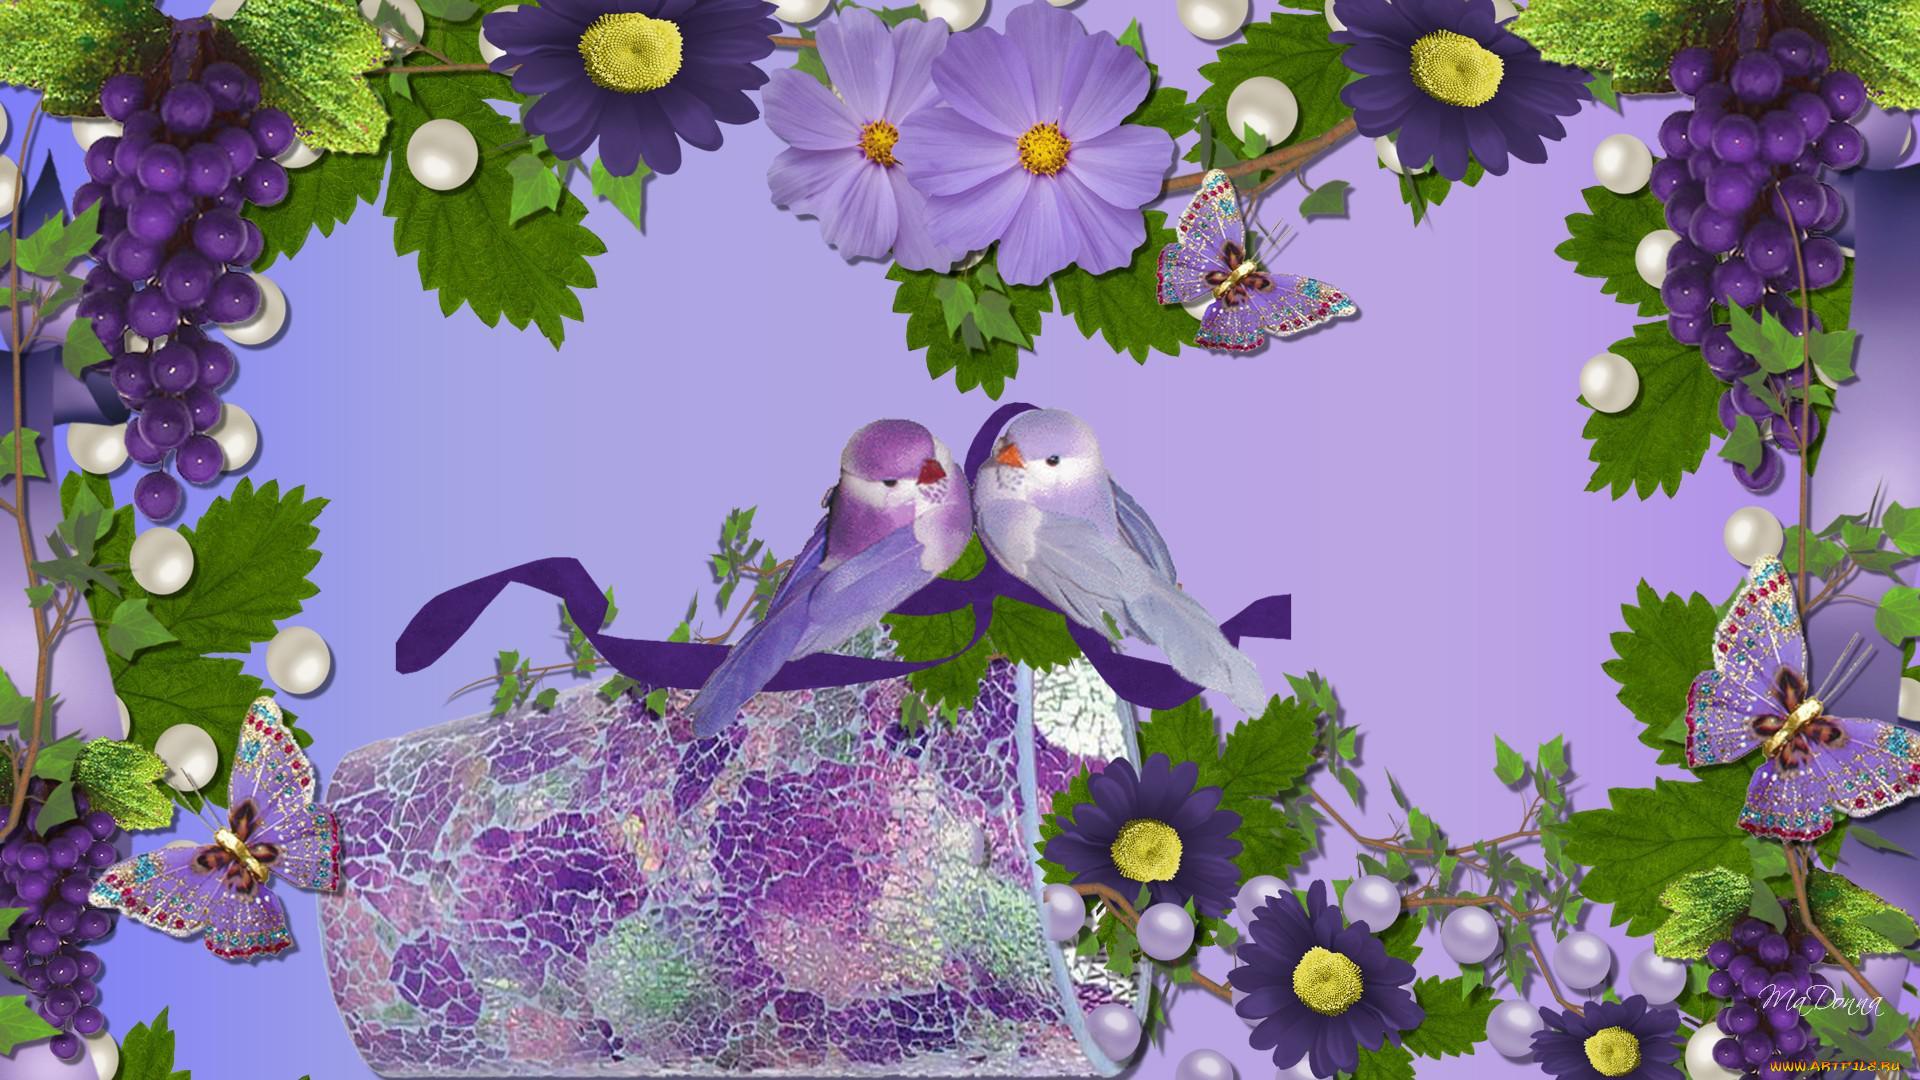 Фон для открытки птицы, аист младенцем открытка